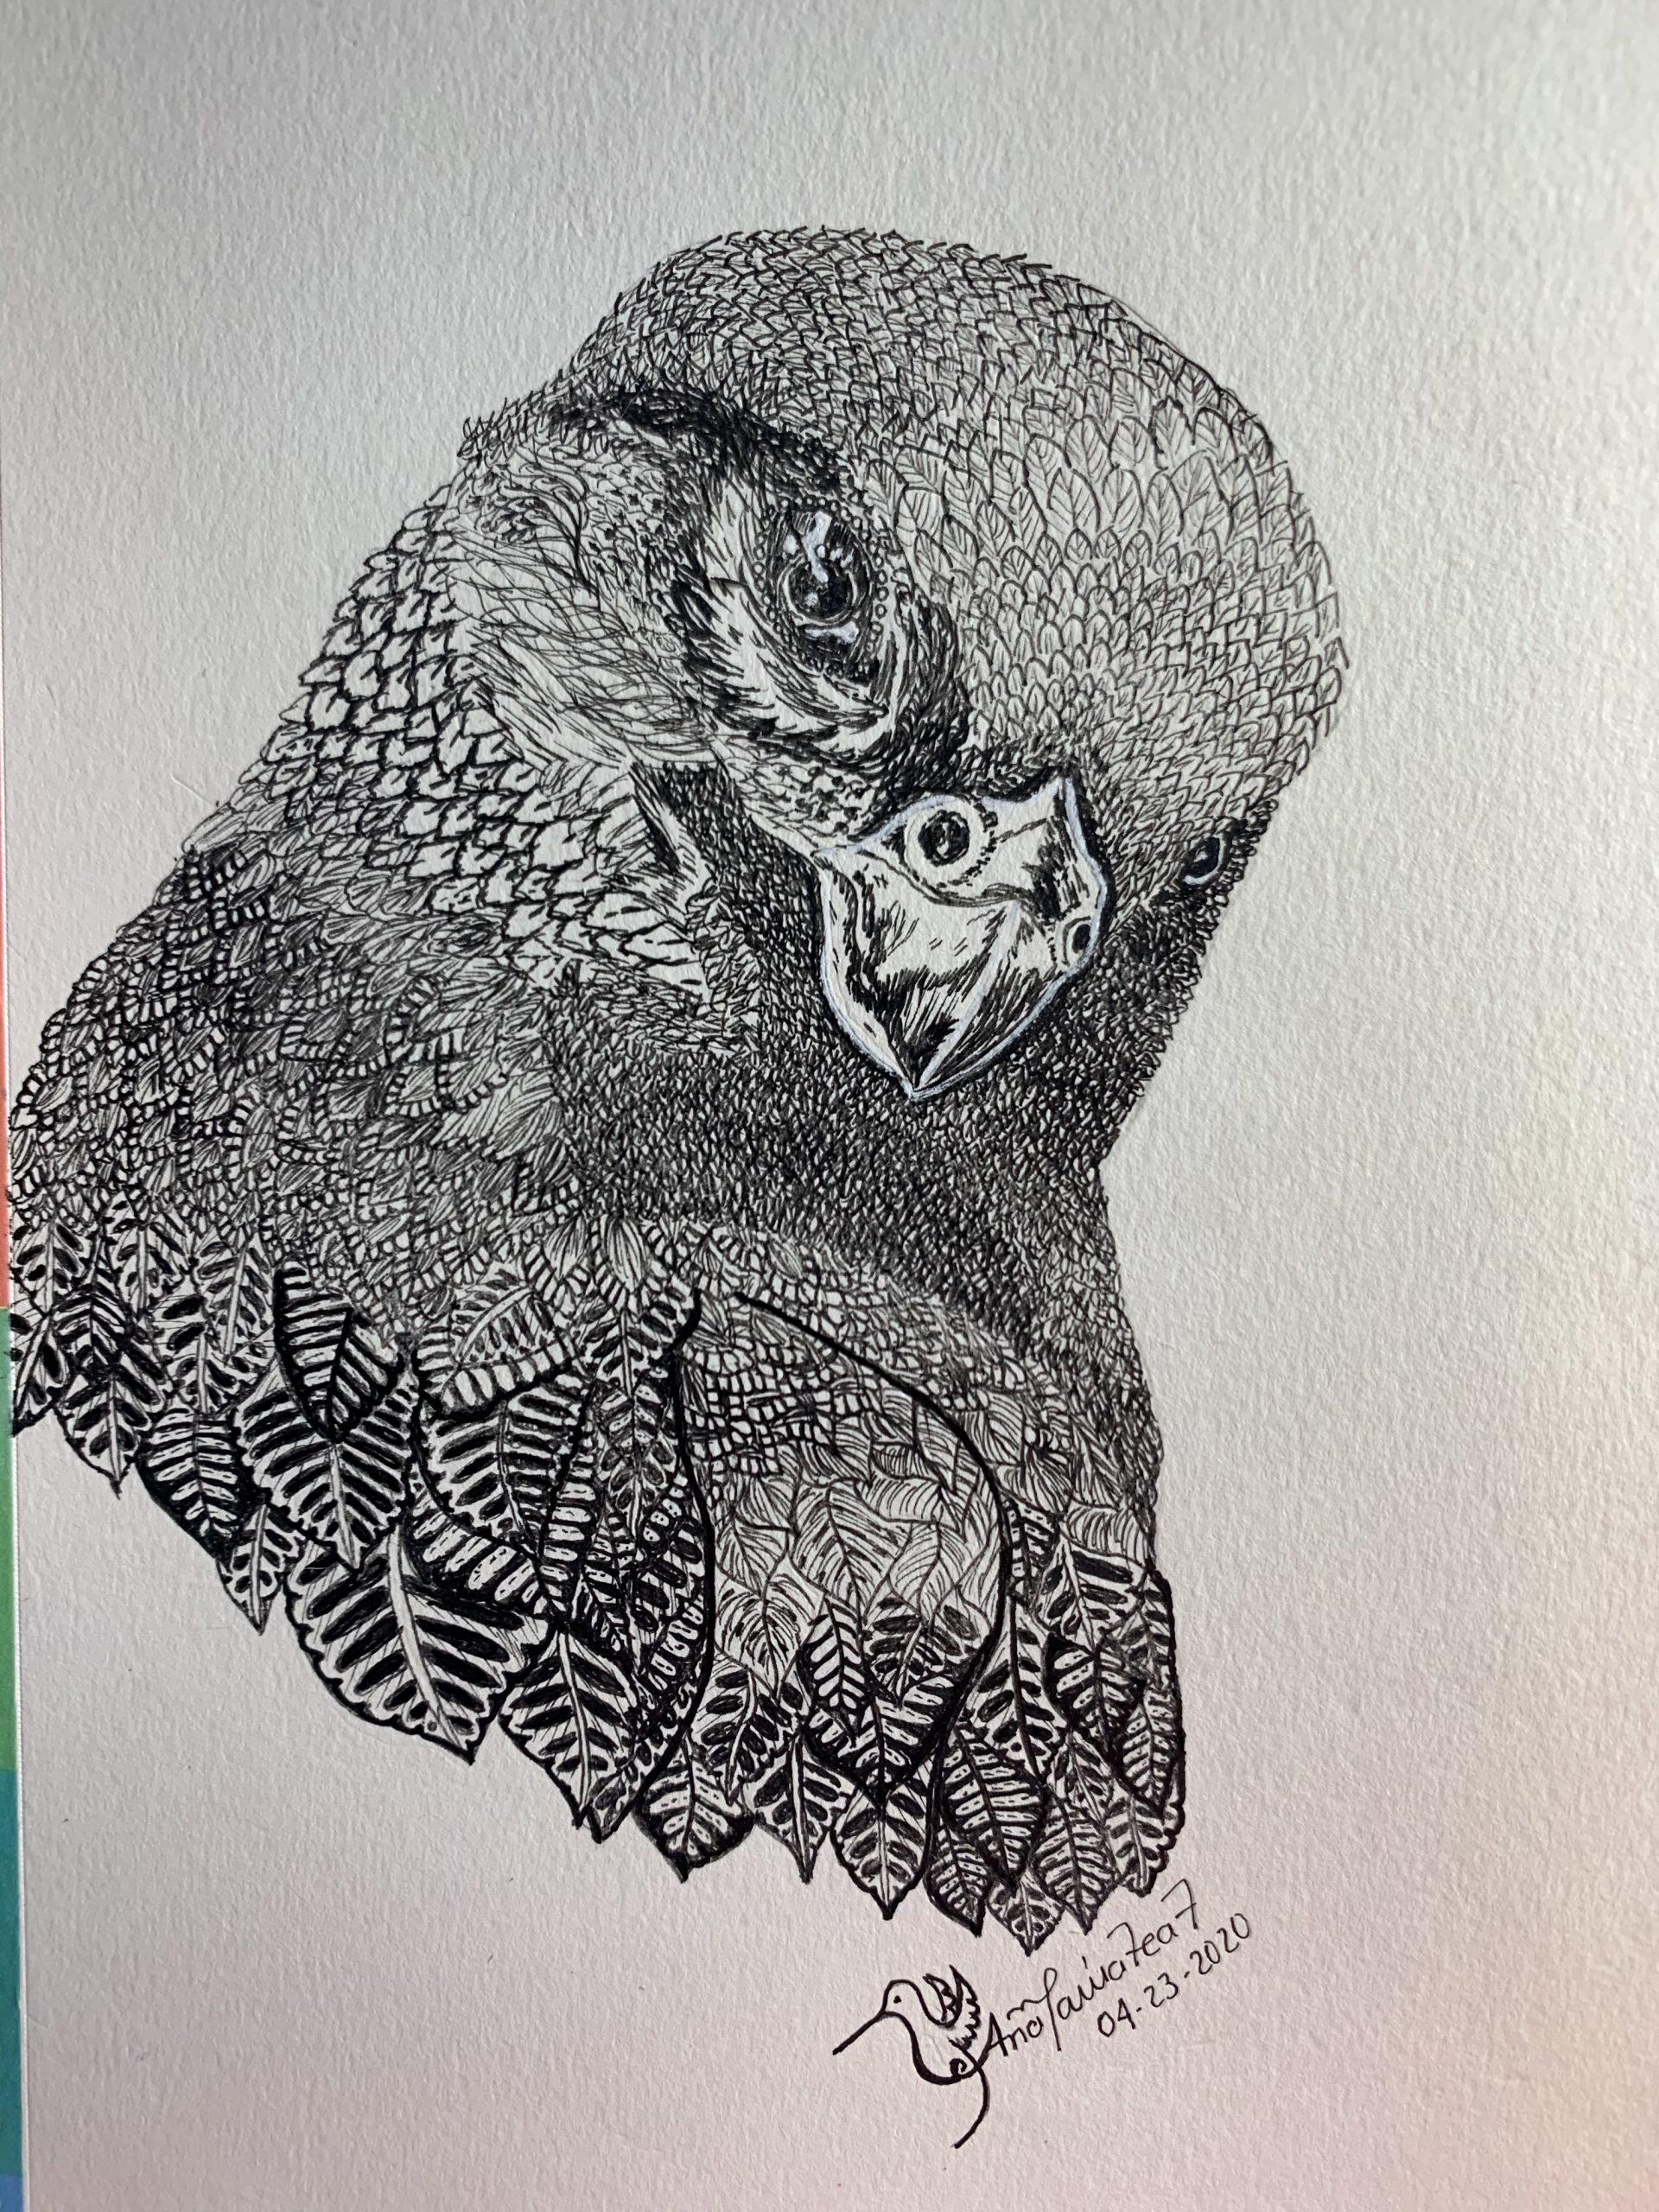 Birds around 2